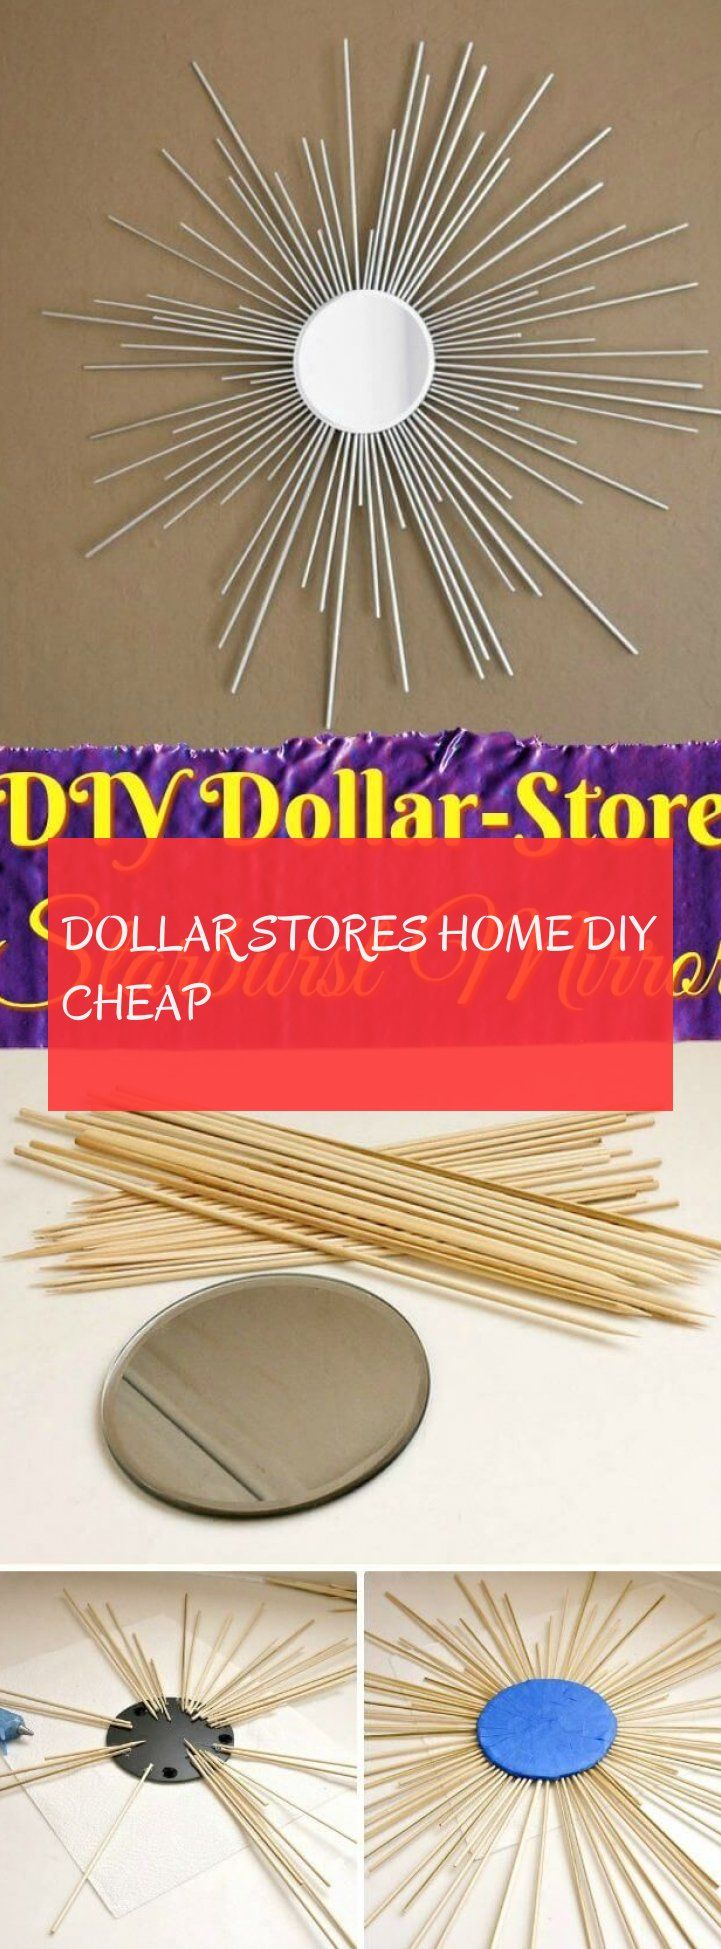 Dollar Stores home diy cheap